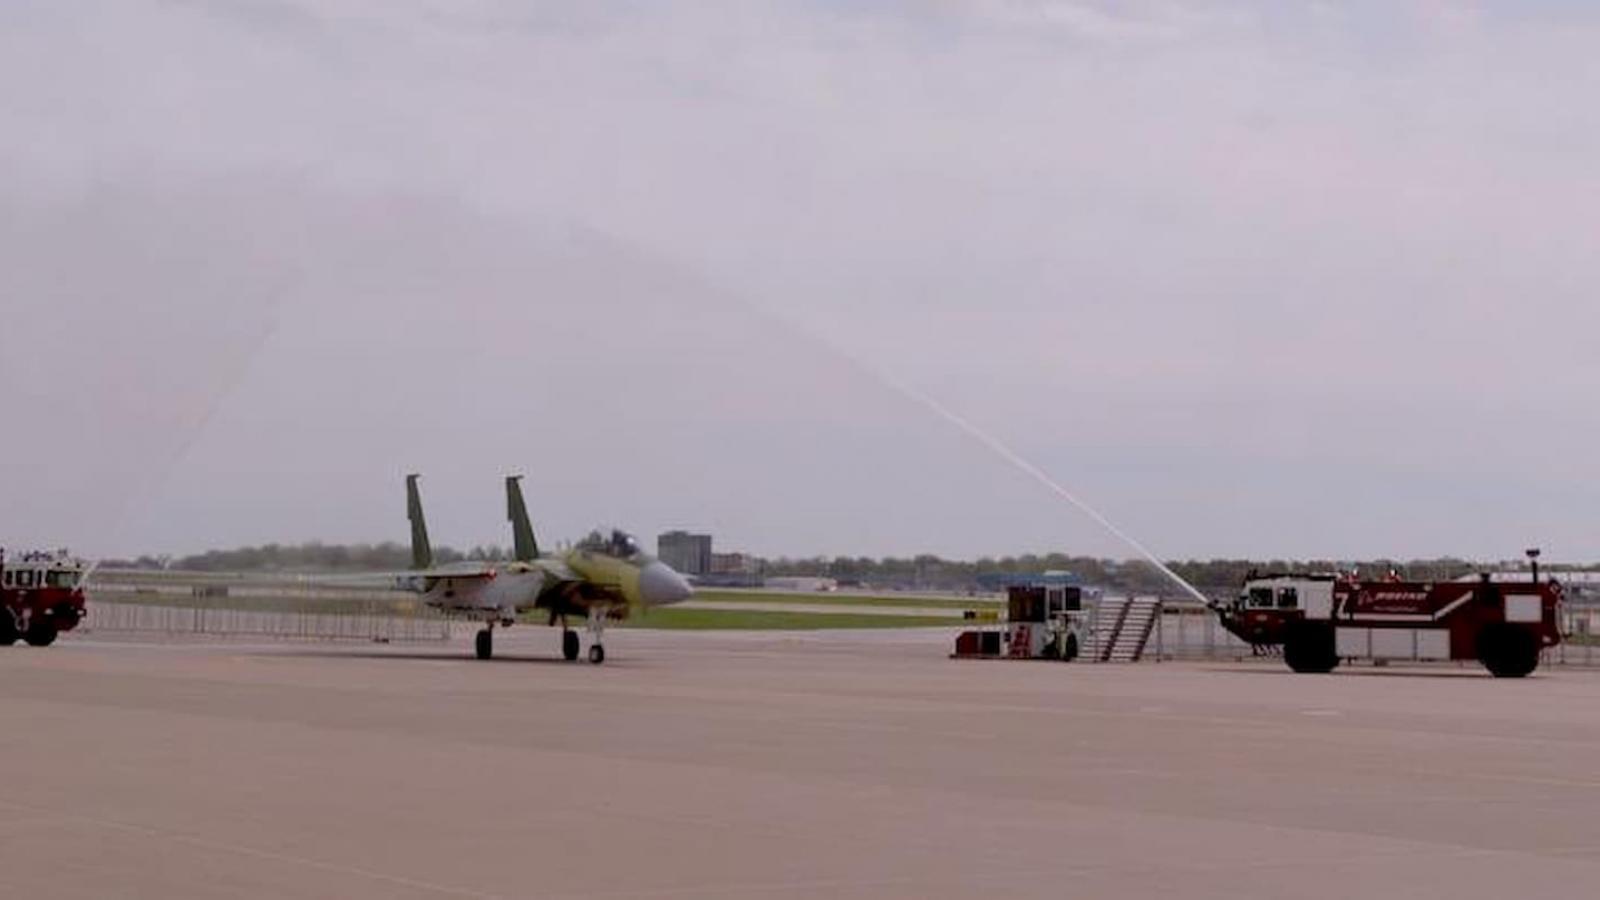 Qatar's F-15 fighter jets make first test flight